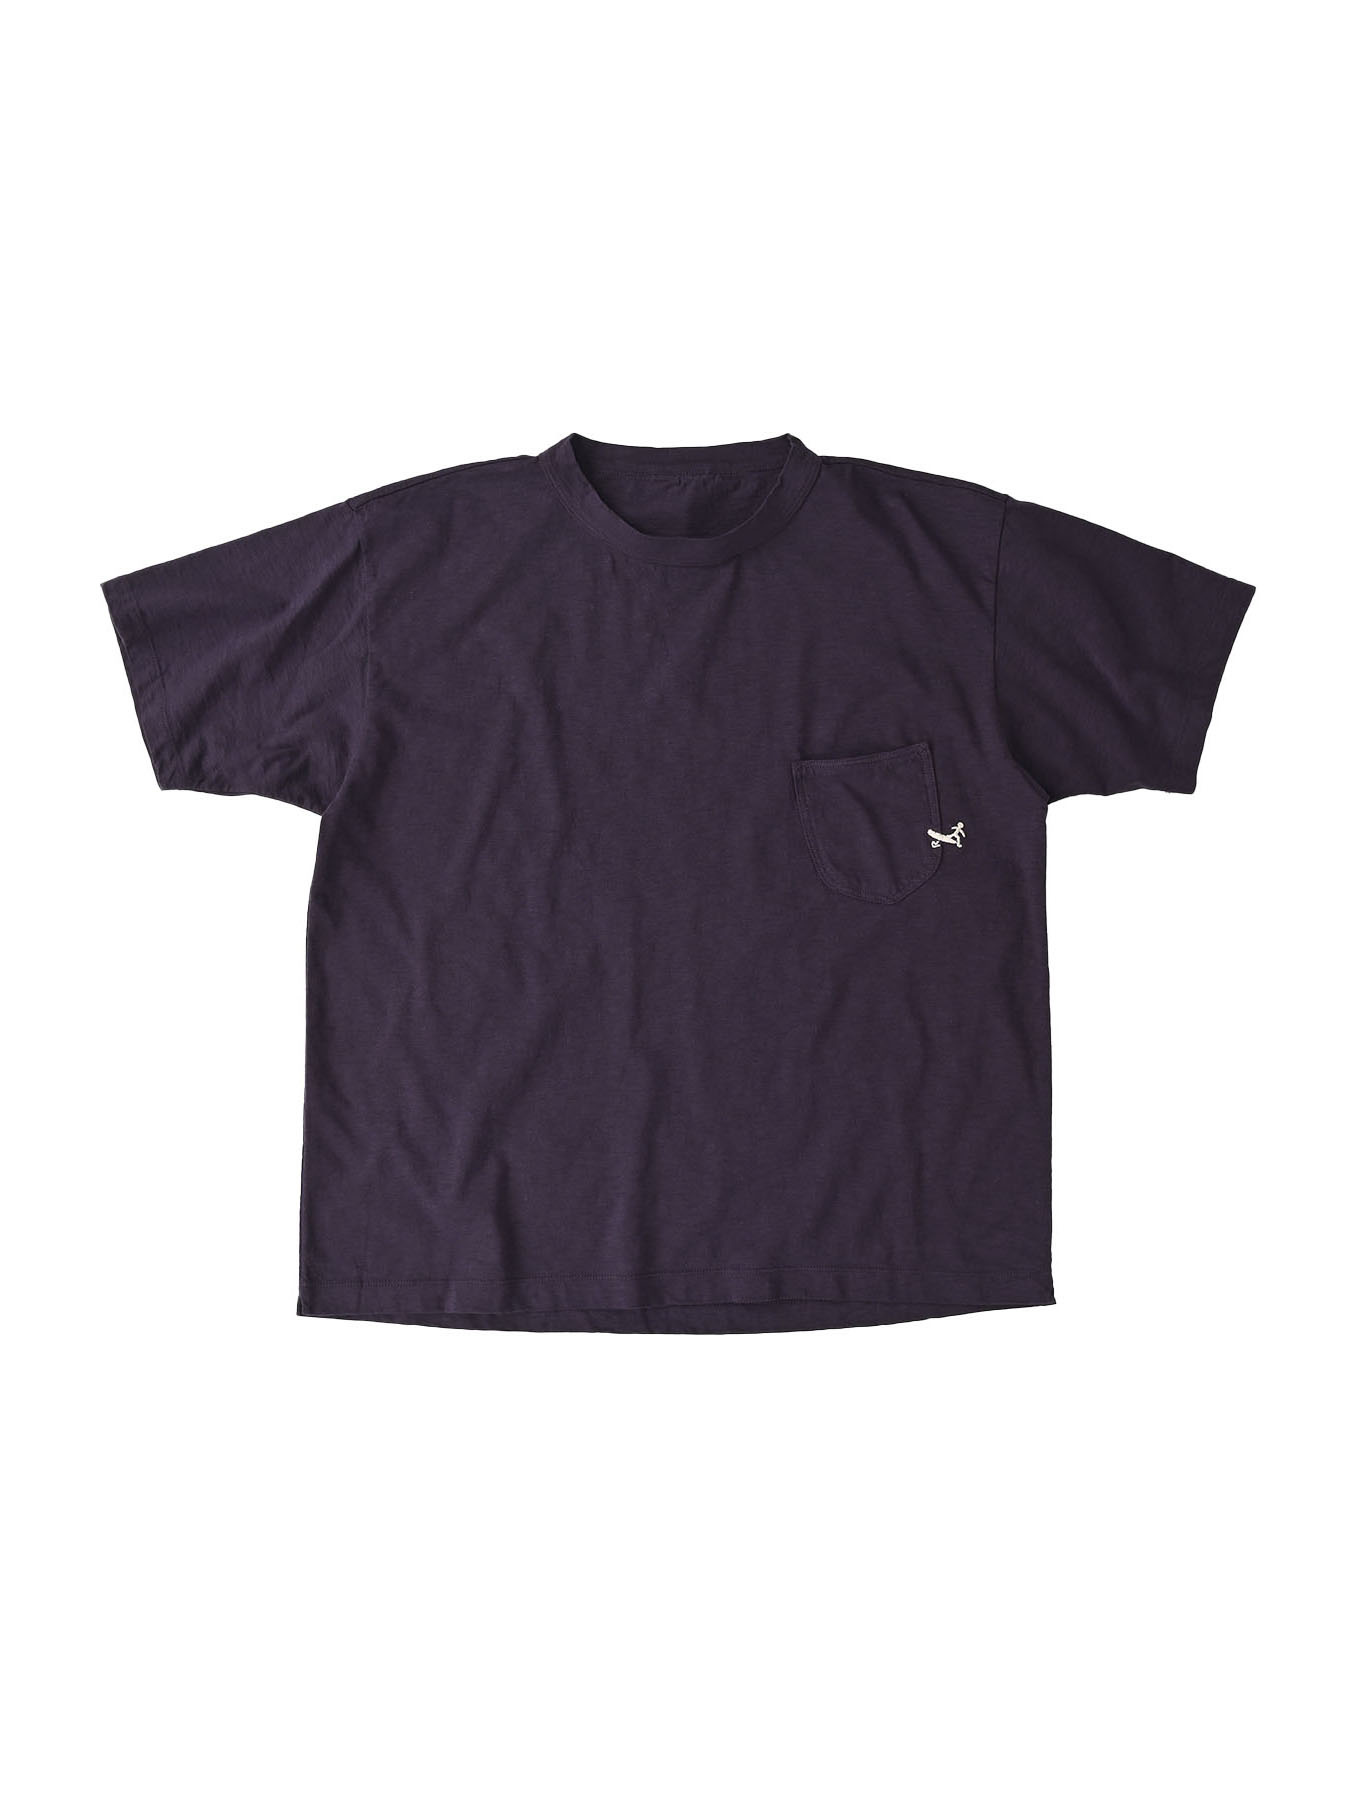 Hayama-kun Embroidered 908 Ocean T-shirt (0621)-1